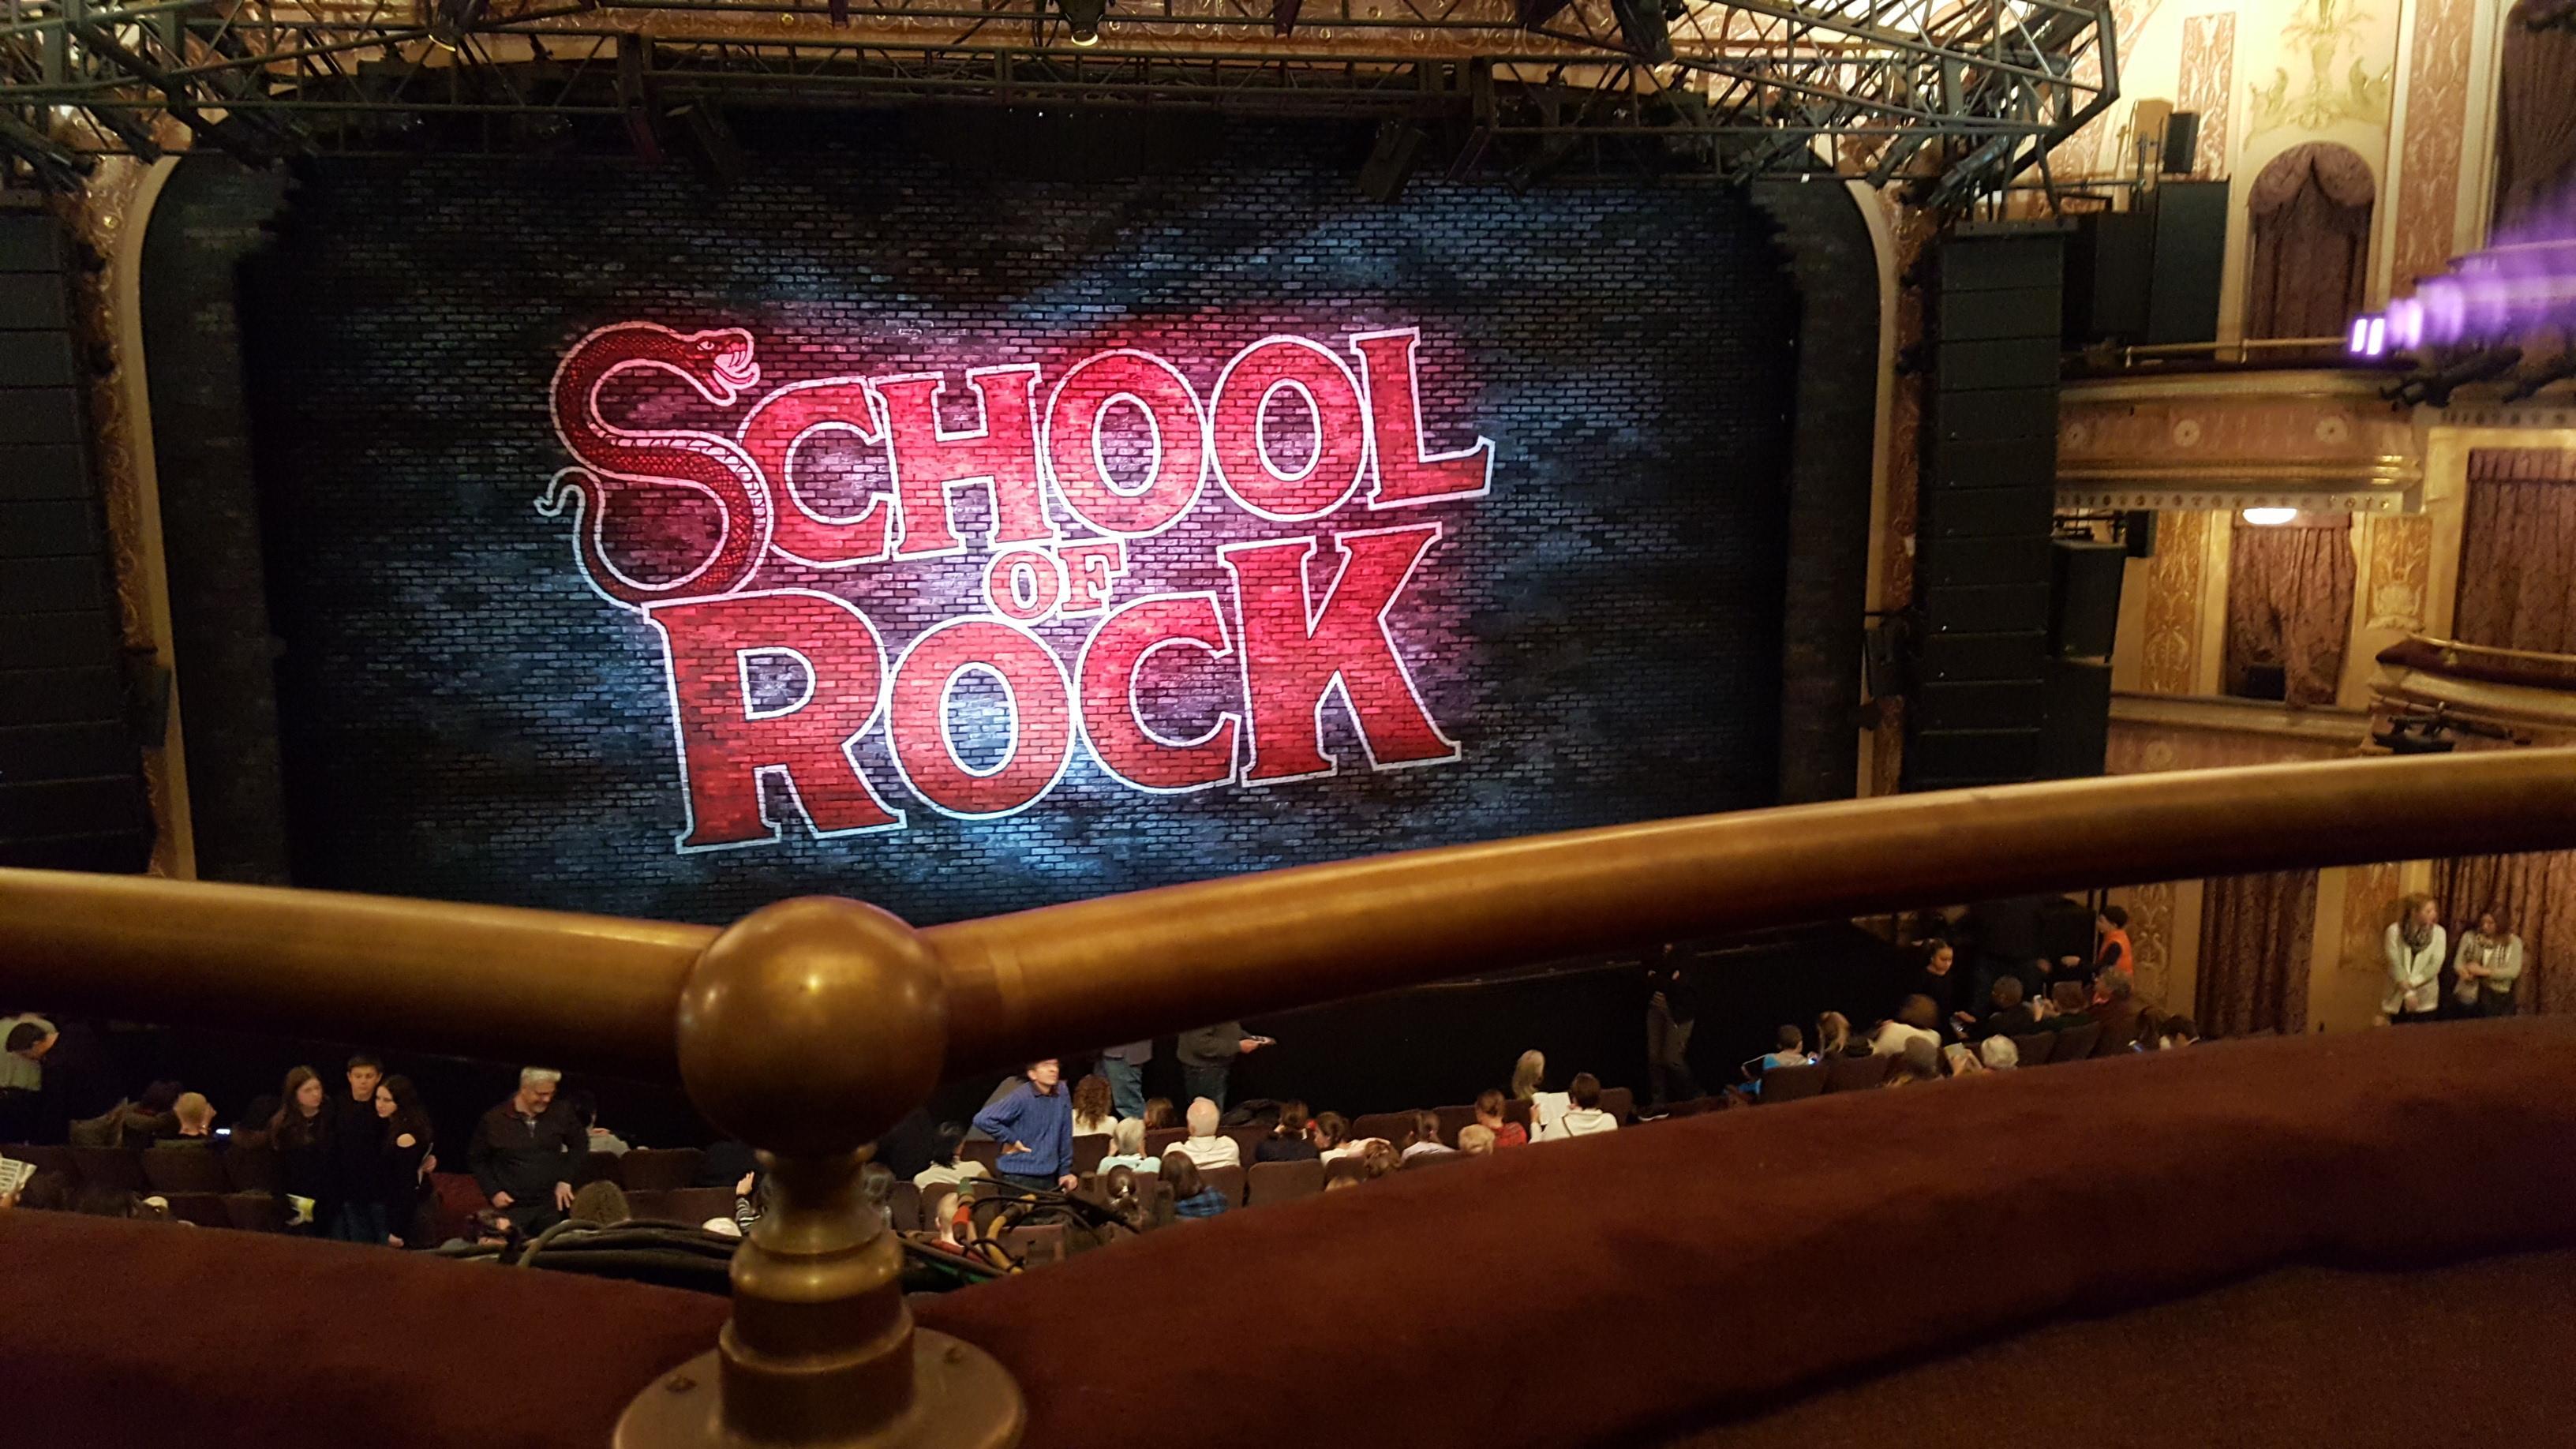 Winter Garden Theatre Section Mezzanine RC Row A Seat 106 & 108